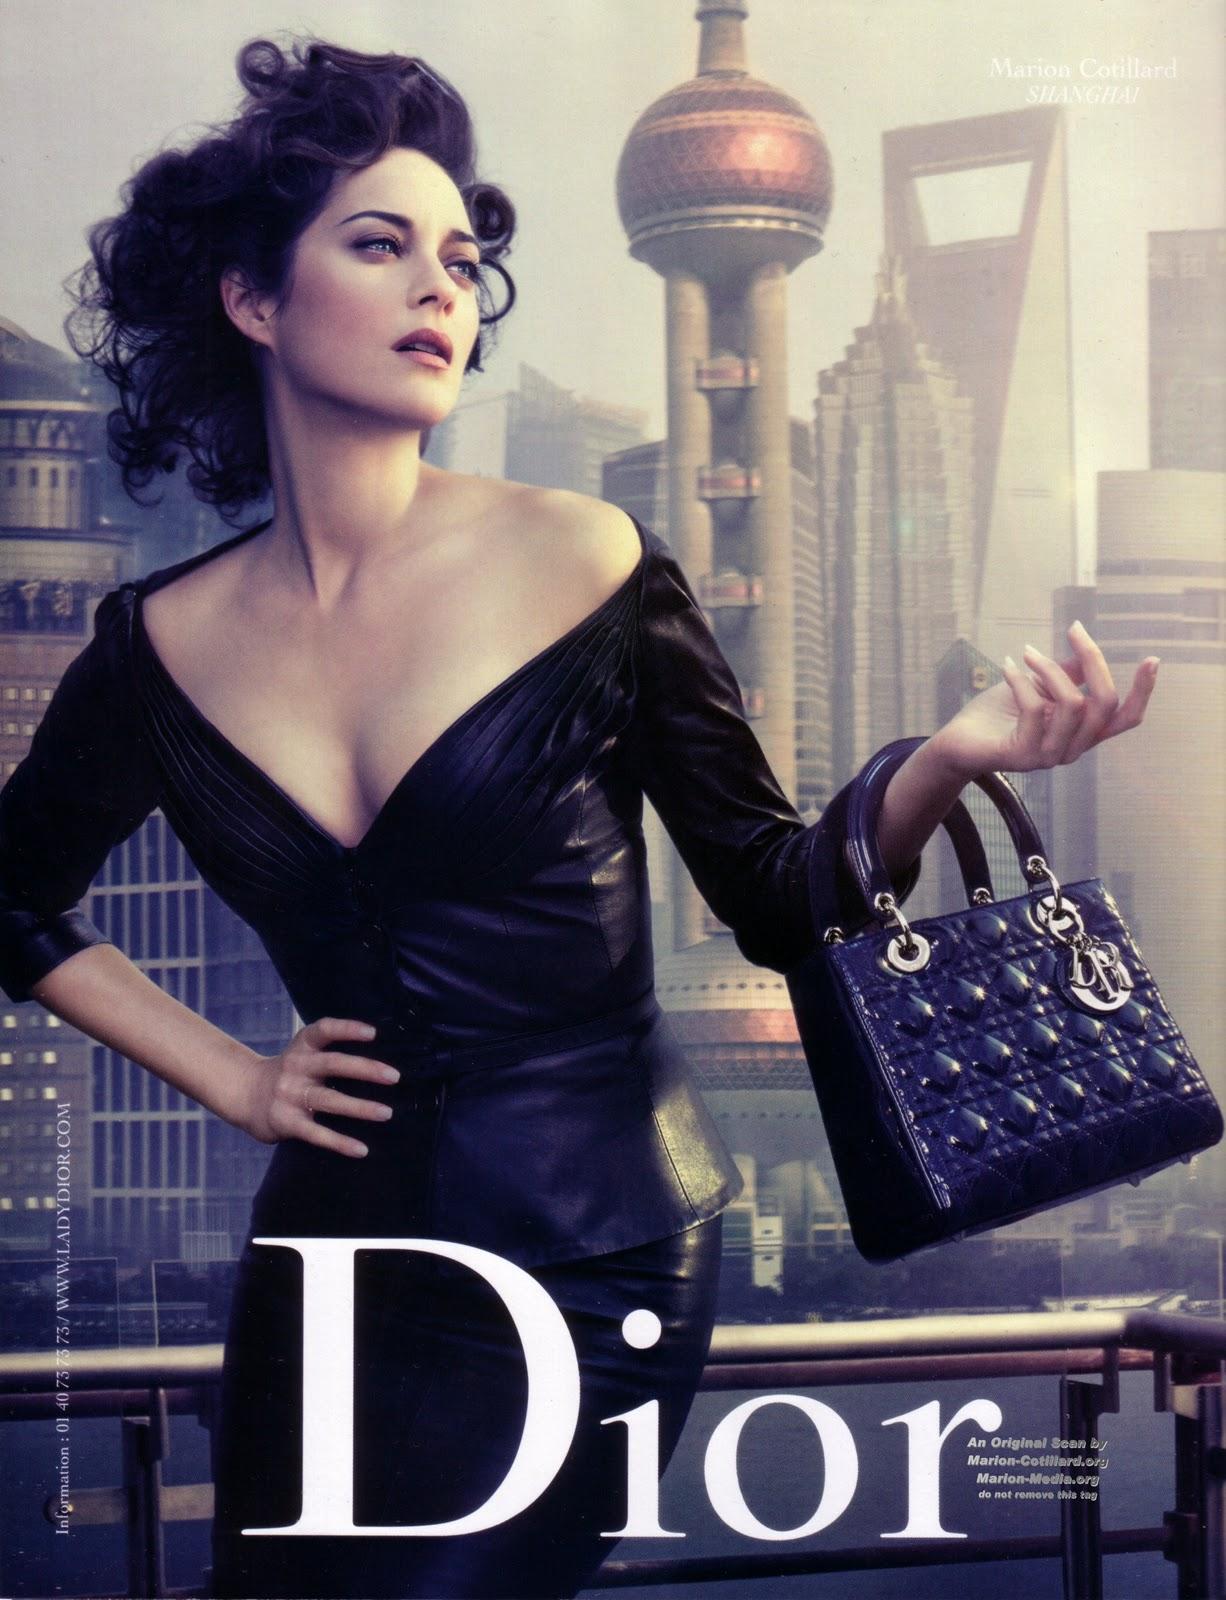 http://4.bp.blogspot.com/-8Qgly_avlkM/Tw4A9uqyczI/AAAAAAAAE5c/g7ByTqLblDg/s1600/Dior+Marion+Cotillard.jpg